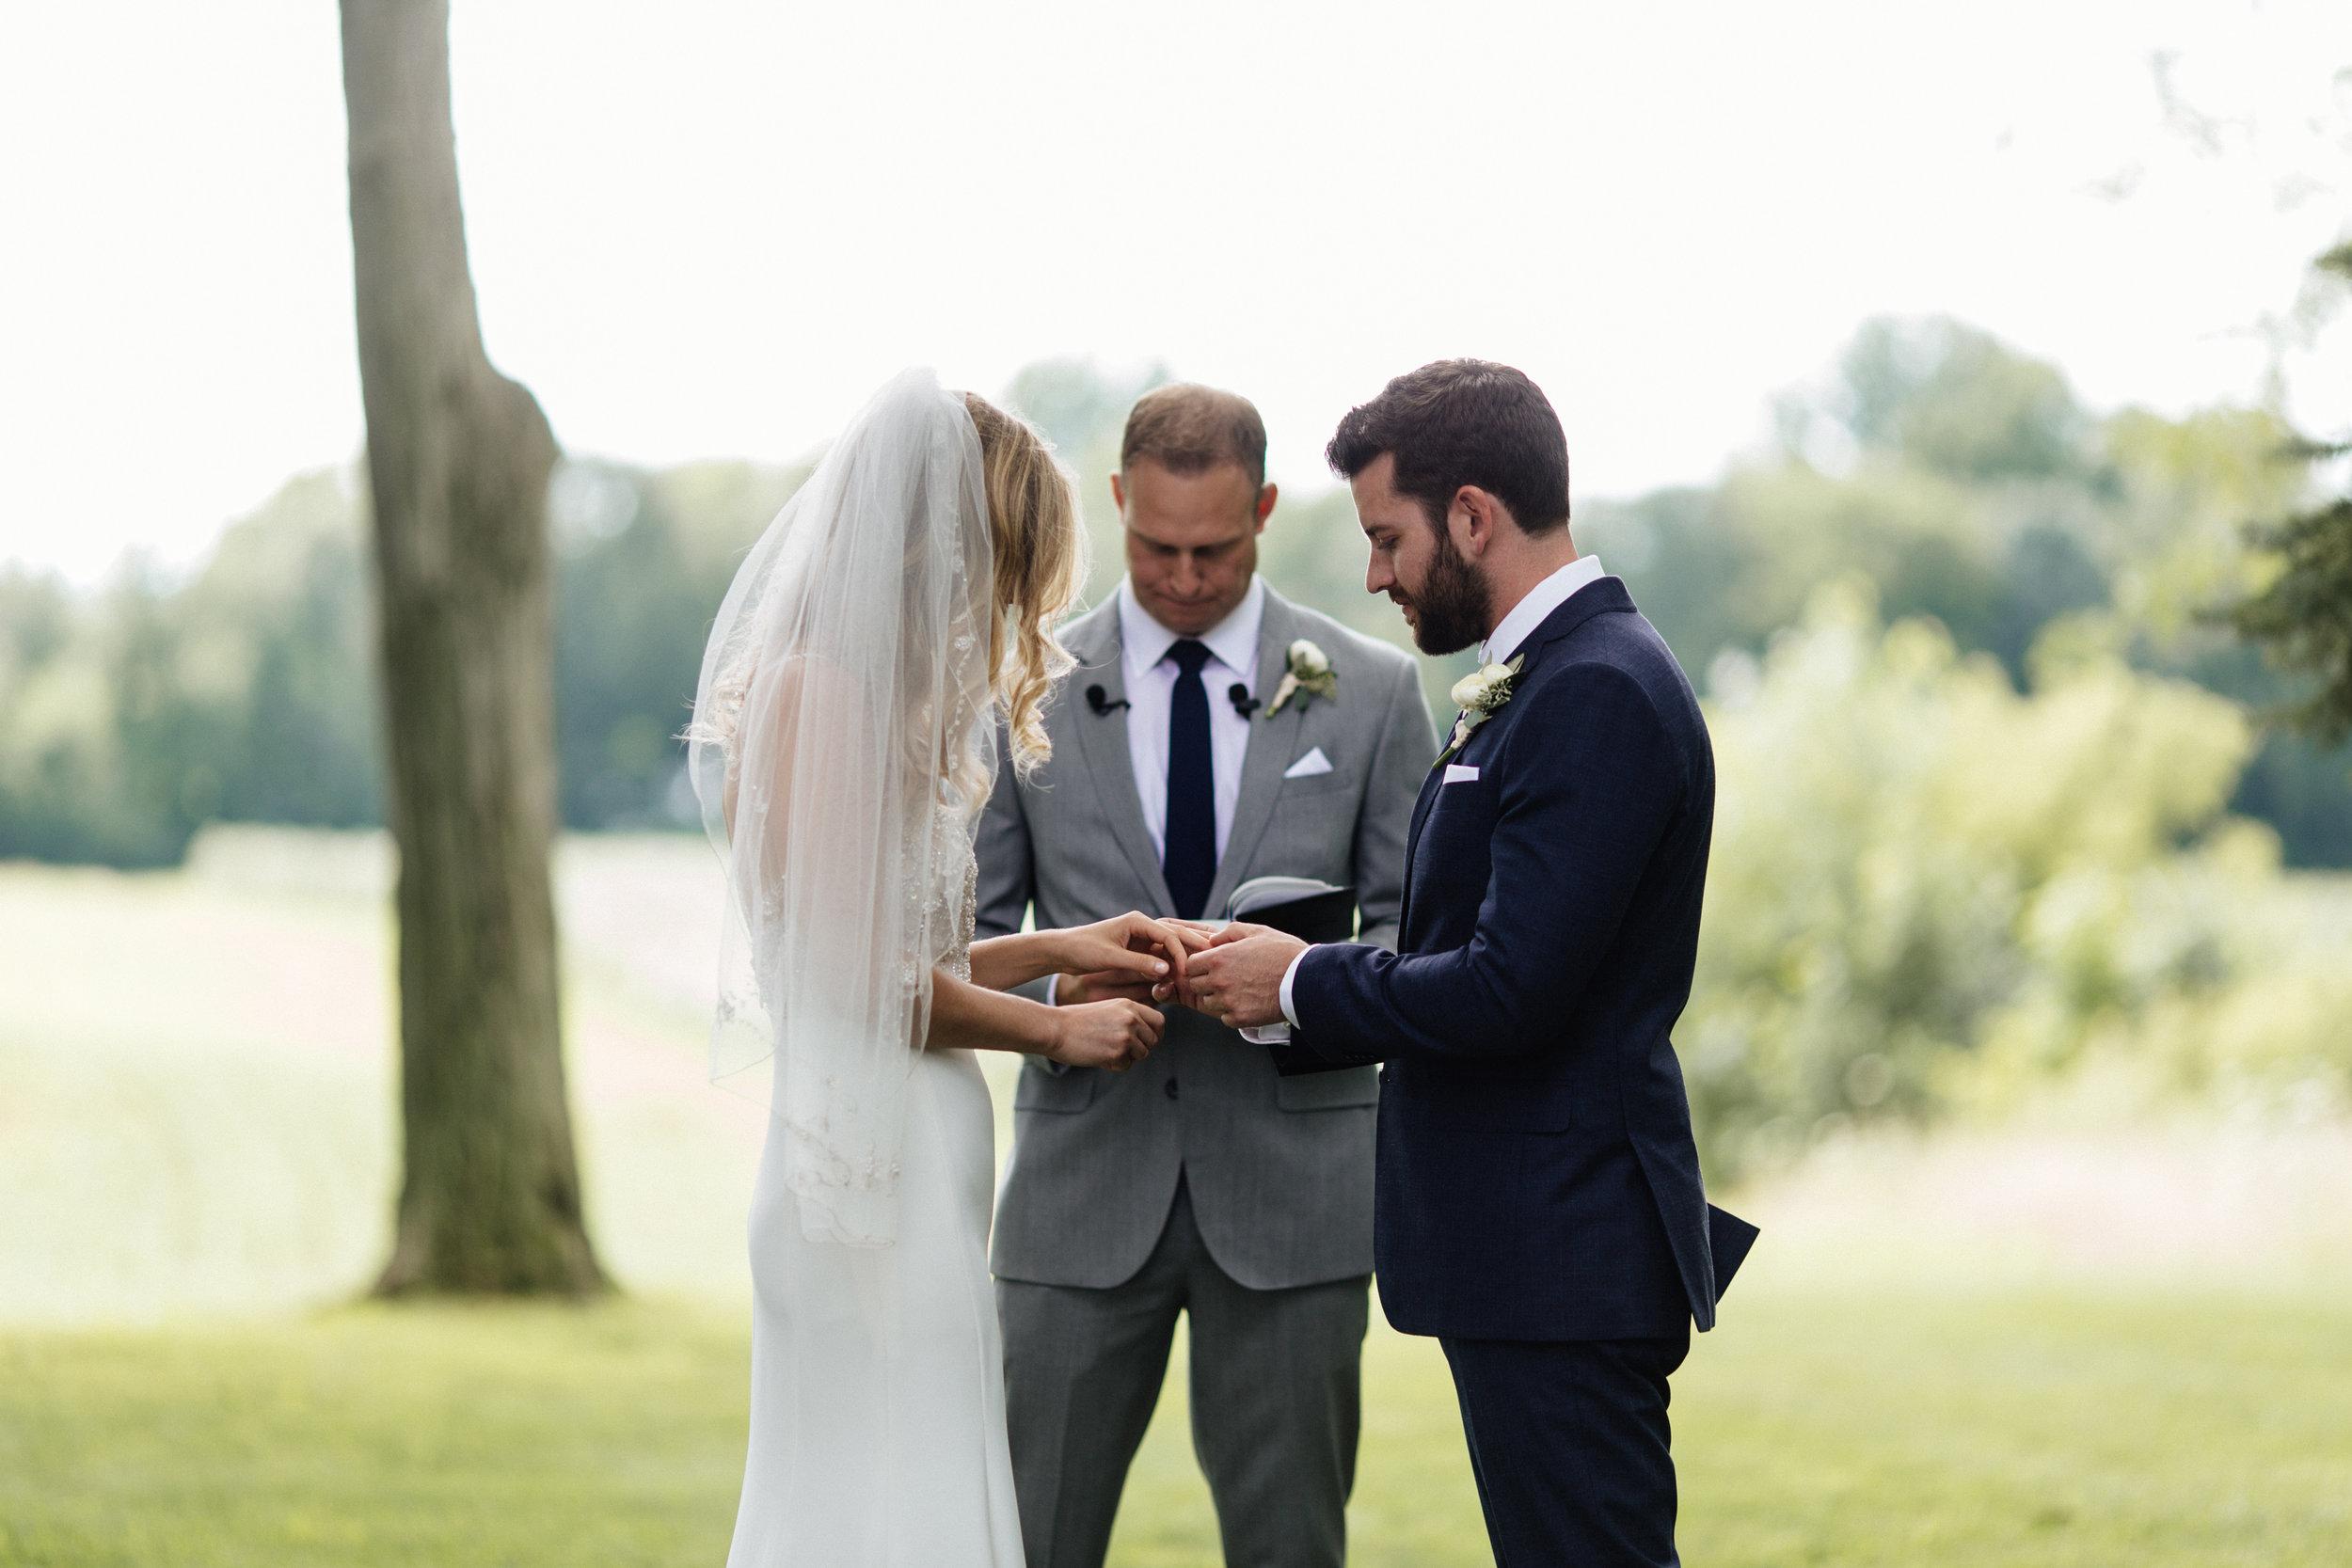 03-Smith-Wedding-Ceremony-171.jpg